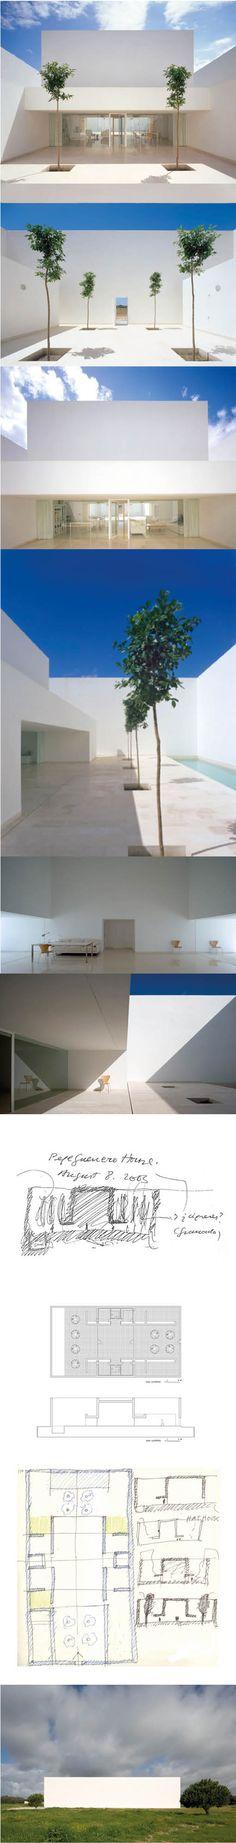 2005 Alberto Campo Baeza - Guerrero House / Vejer Cádiz Spain / concrete / white / minimalism